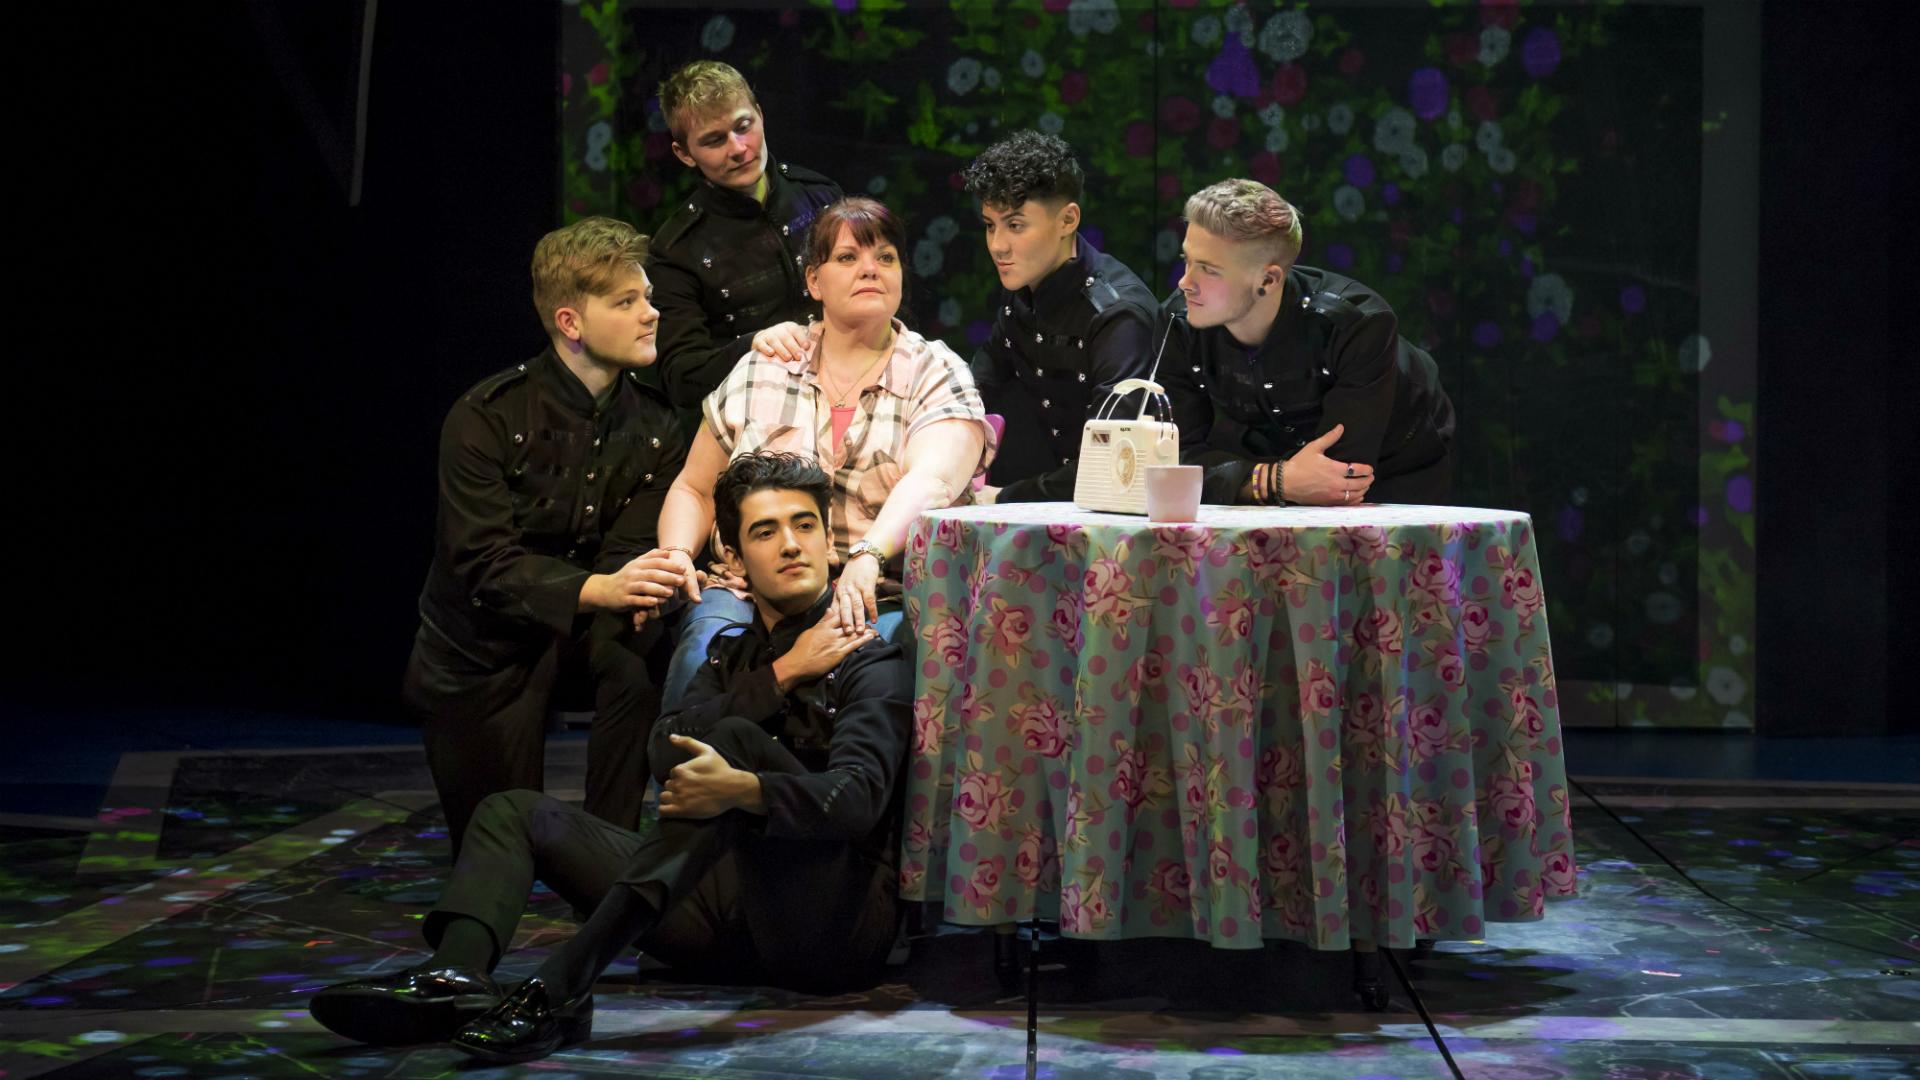 The Band at Theatre Royal Haymarket. Photo credit: Matt Crockett. Image courtesy of Amanda Malpass PR.